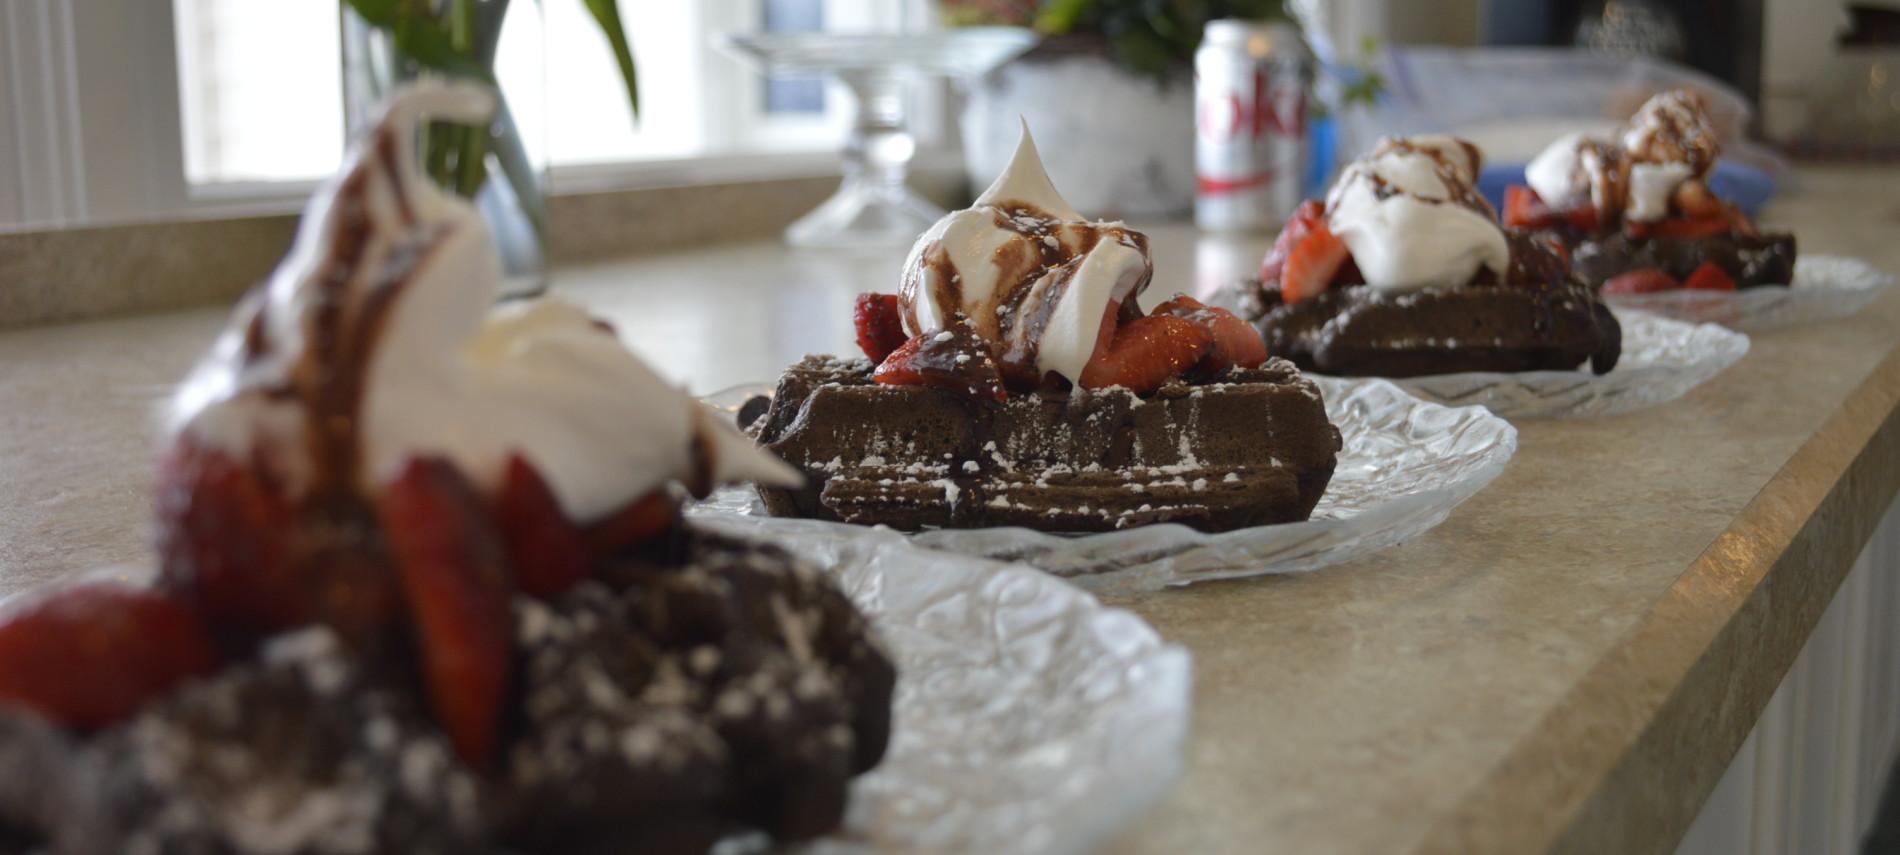 Double Chocolate Waffles from Inn at Harbor Hill Marina